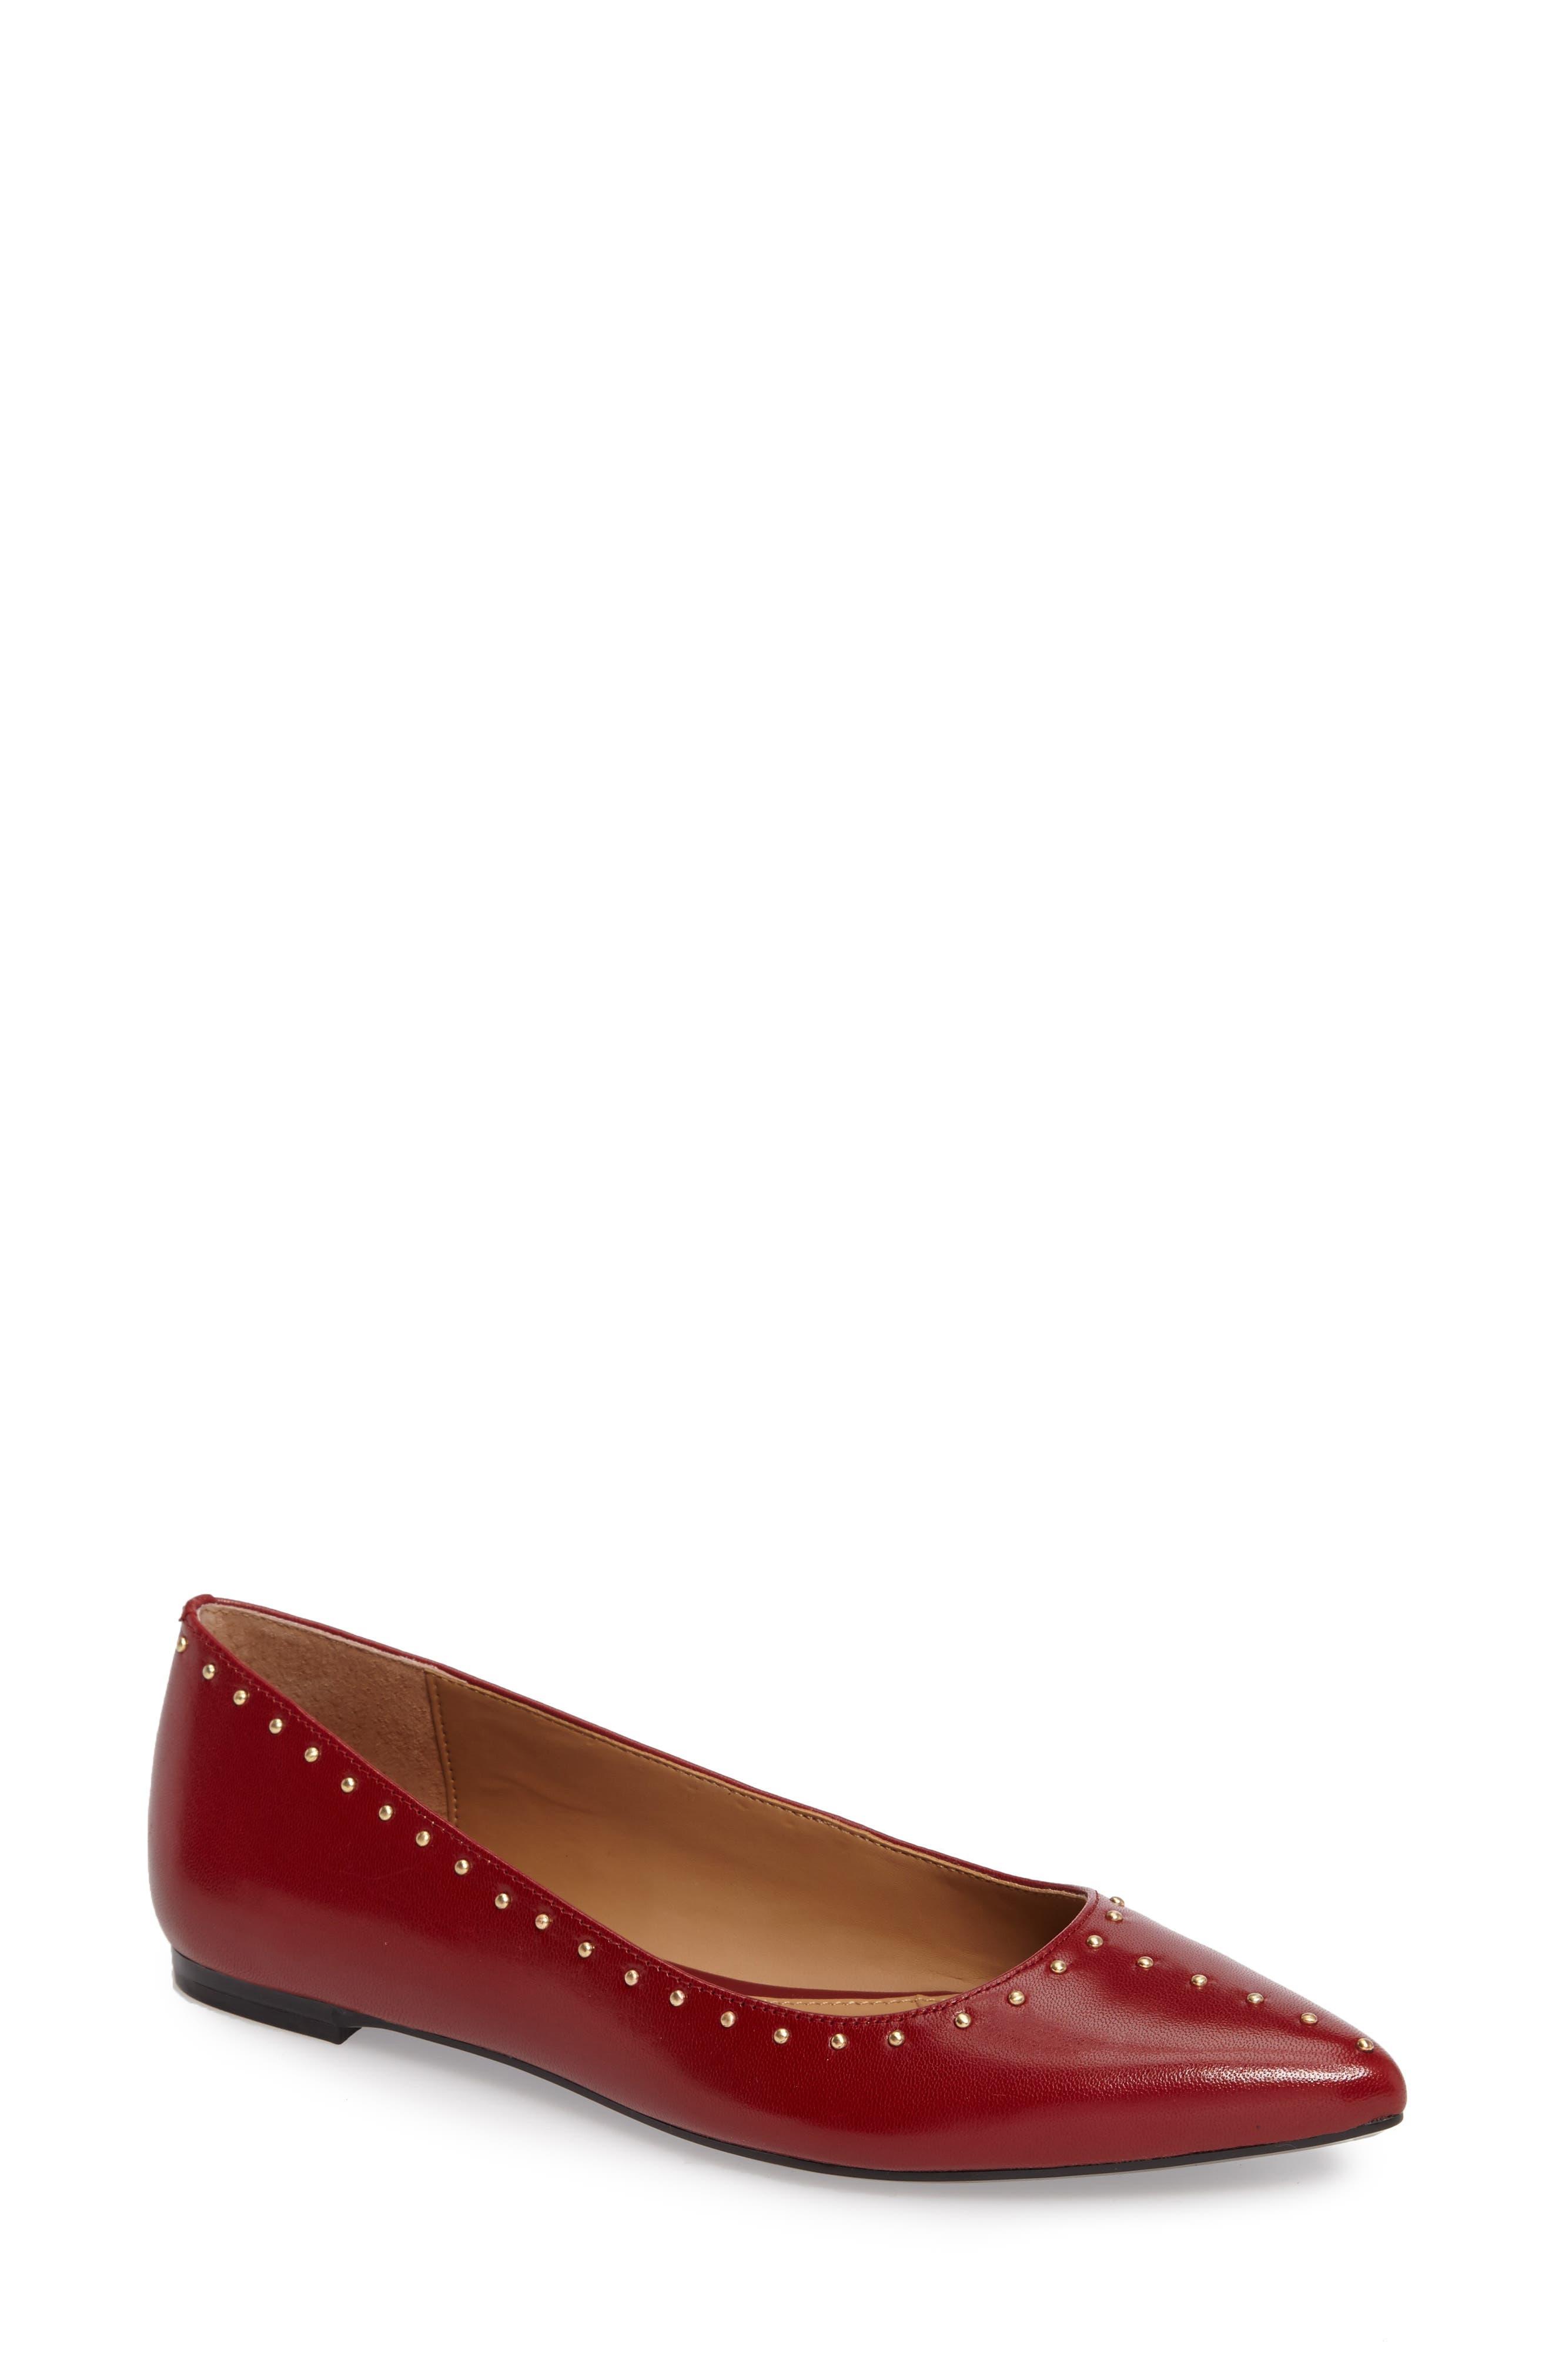 Main Image - Calvin Klein Genie Pointy Toe Flat (Women)